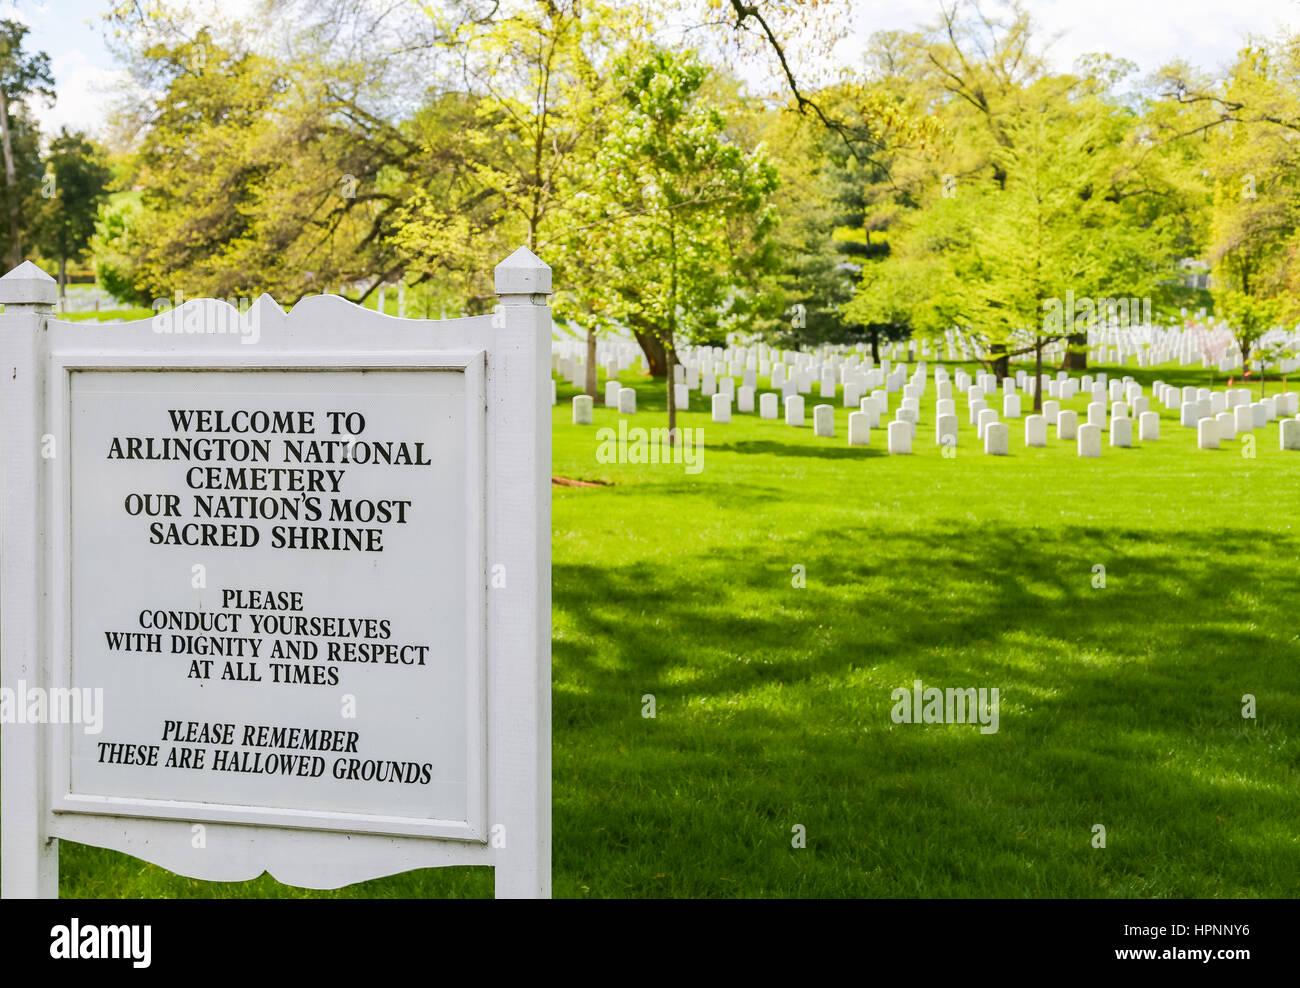 Arlington, USA - May 2, 2015: Sign with behavioral code near the entrance of Arlington National Cemetery. - Stock Image